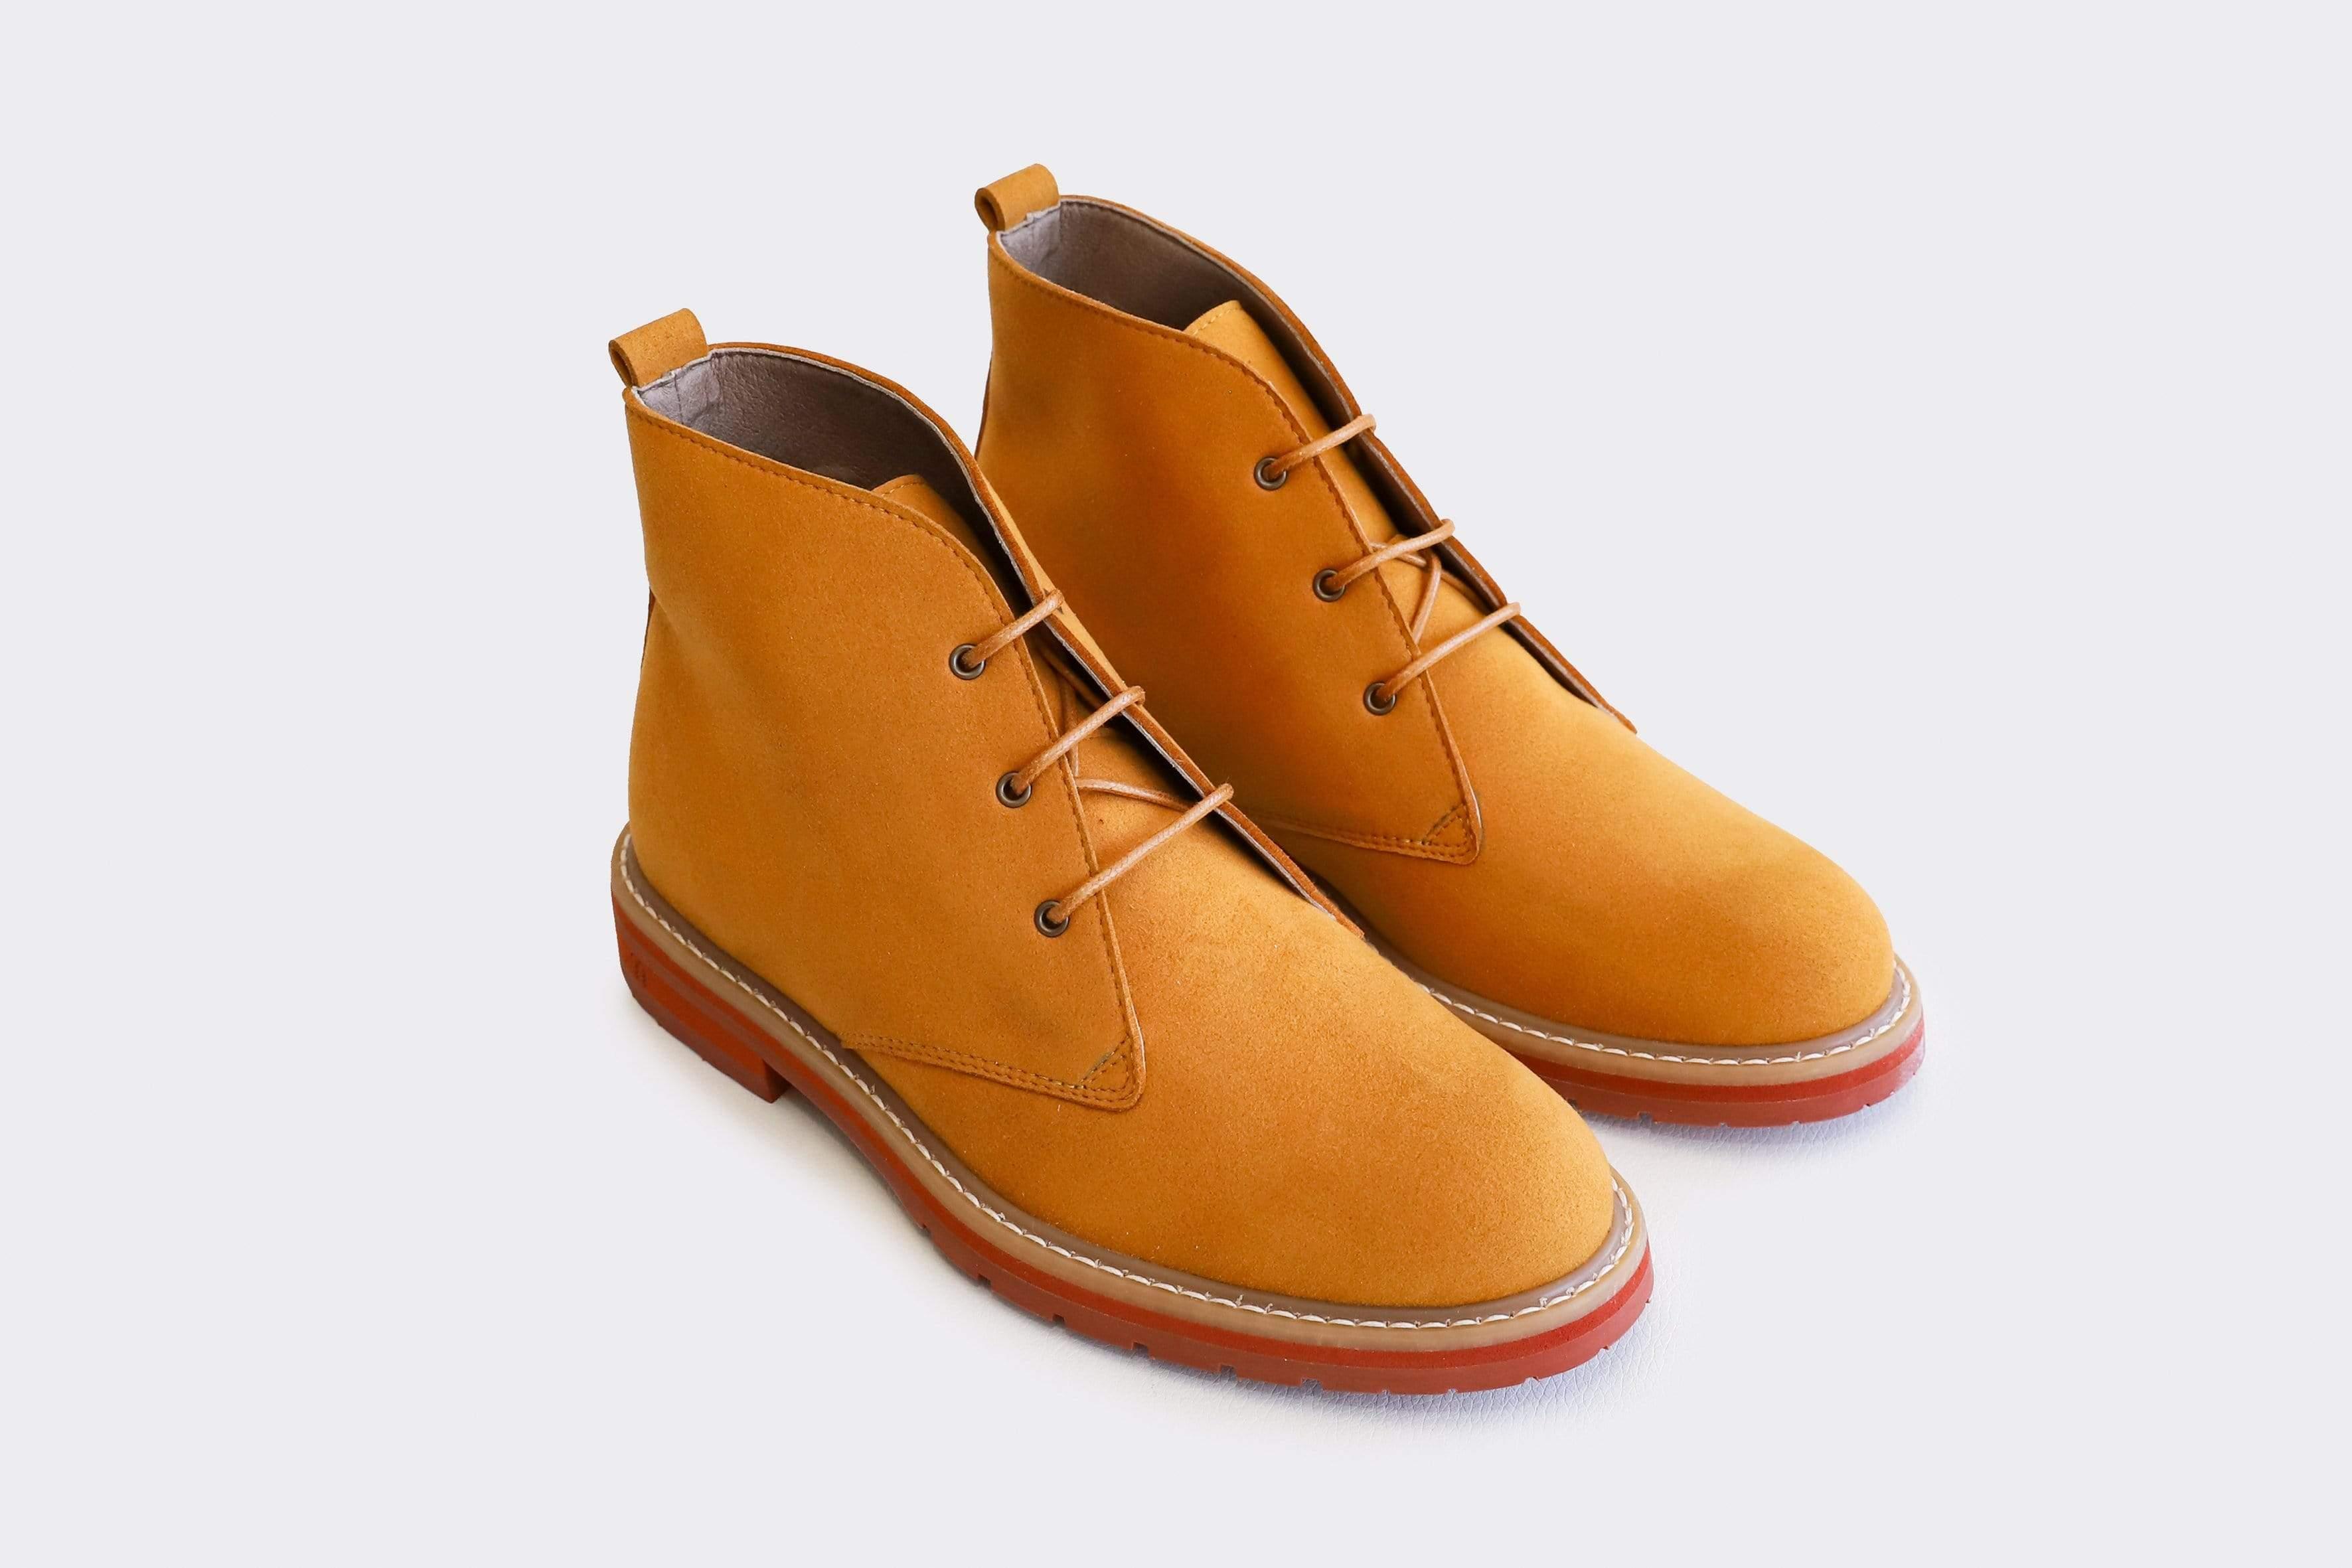 Good Guys Don't Wear Leather AYITA 2.0 Vegan Suede Desert Boot   Brandy